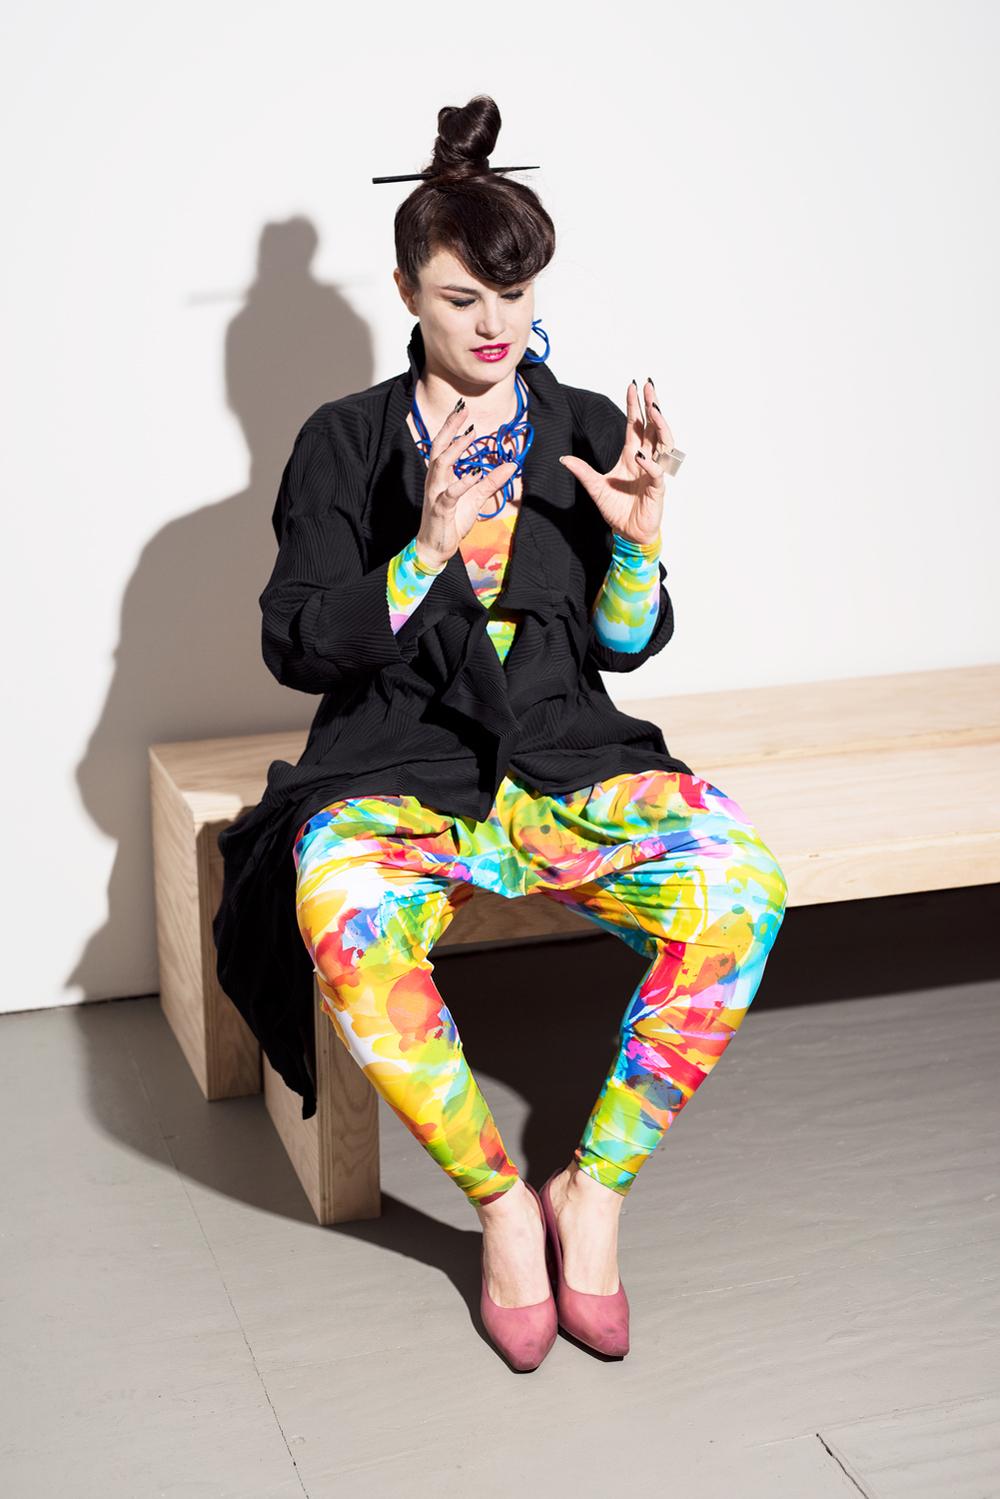 Eva Franch i Gilabert for the 2015 Design Guide, Metropolis Magazine